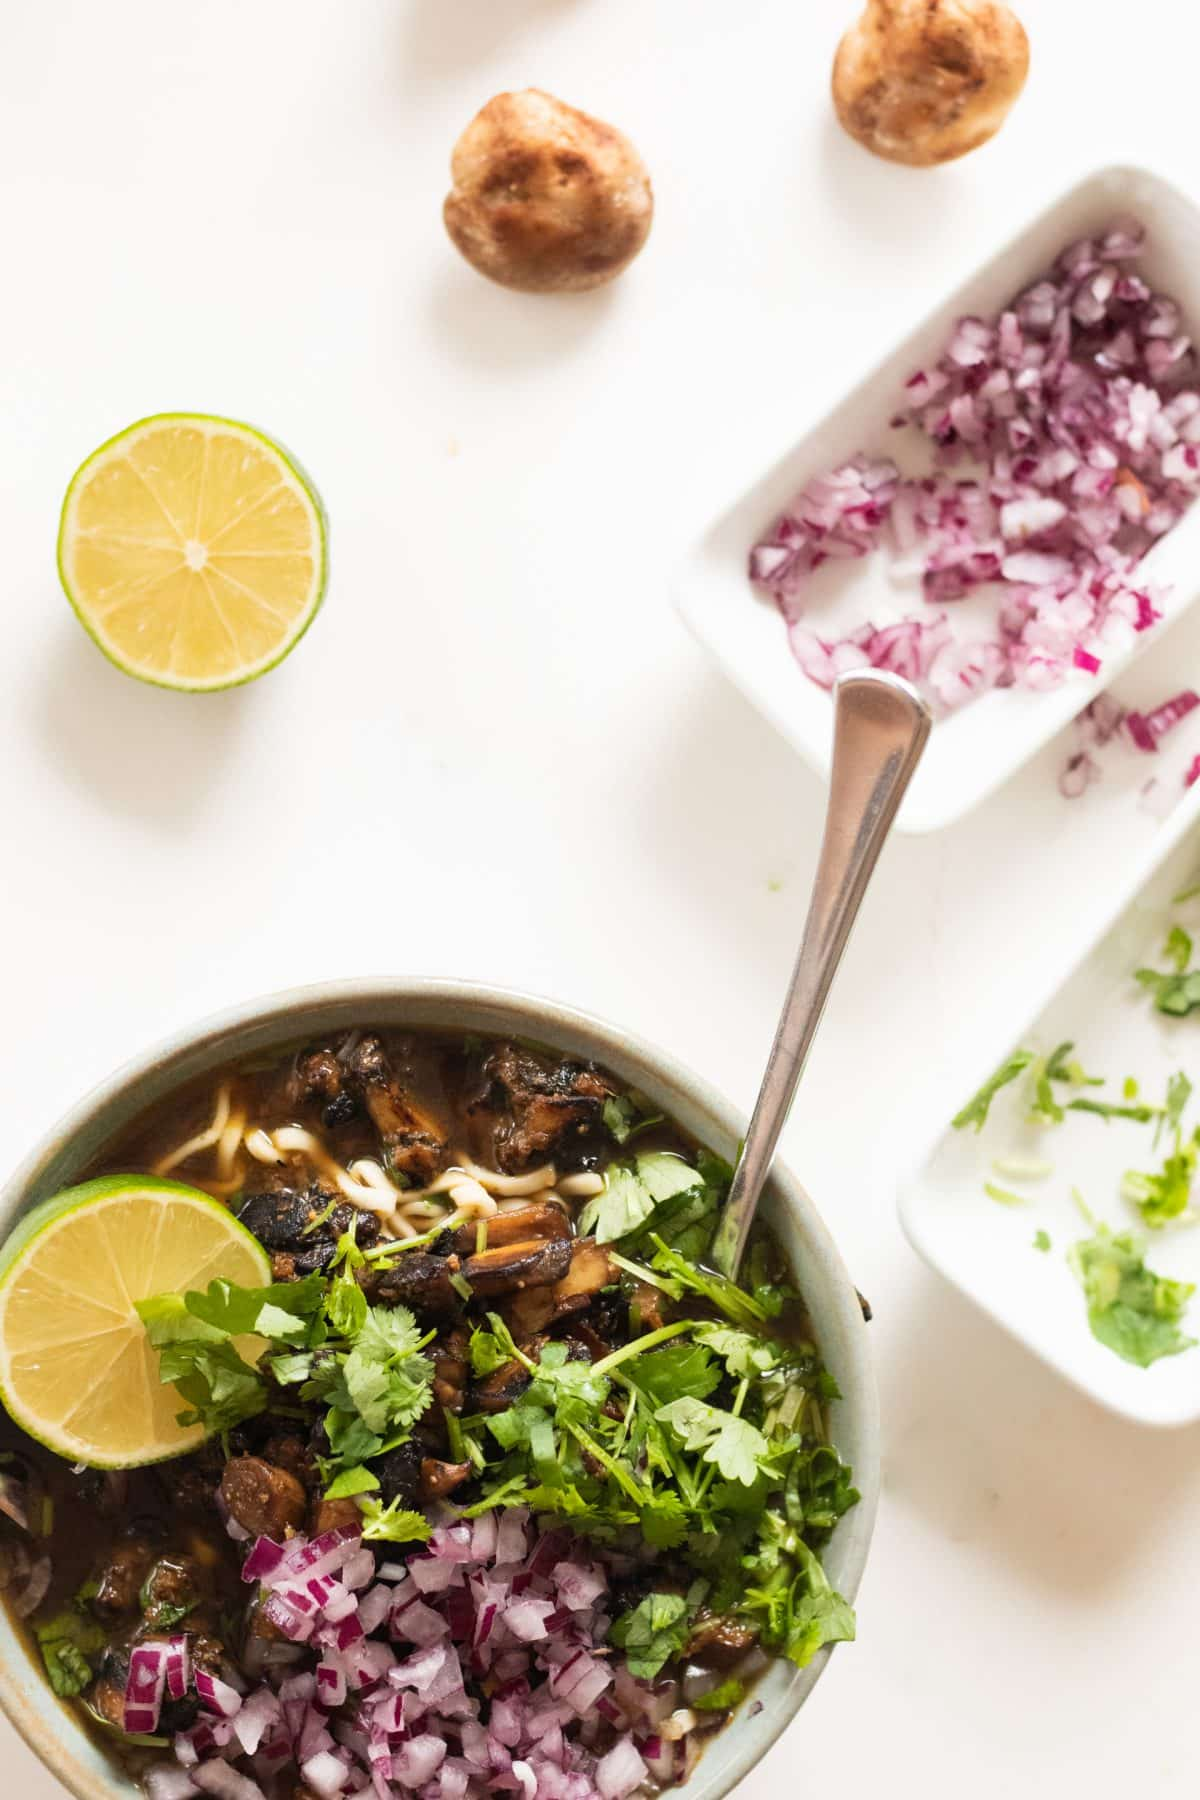 top view of a bowl of vegetarian ramen with mushrooms